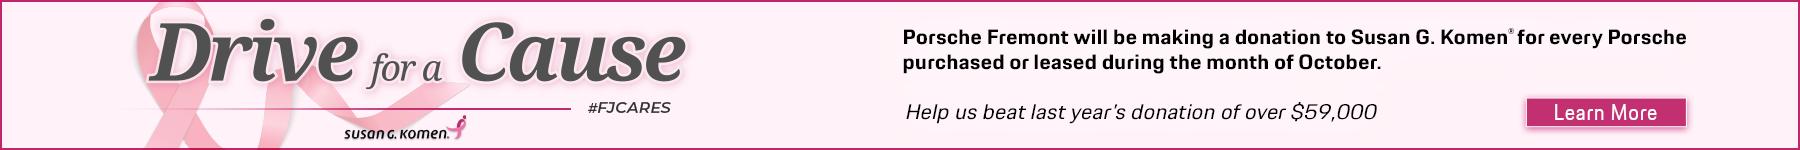 SGK Website Banner 2021 – Porsche Fremont